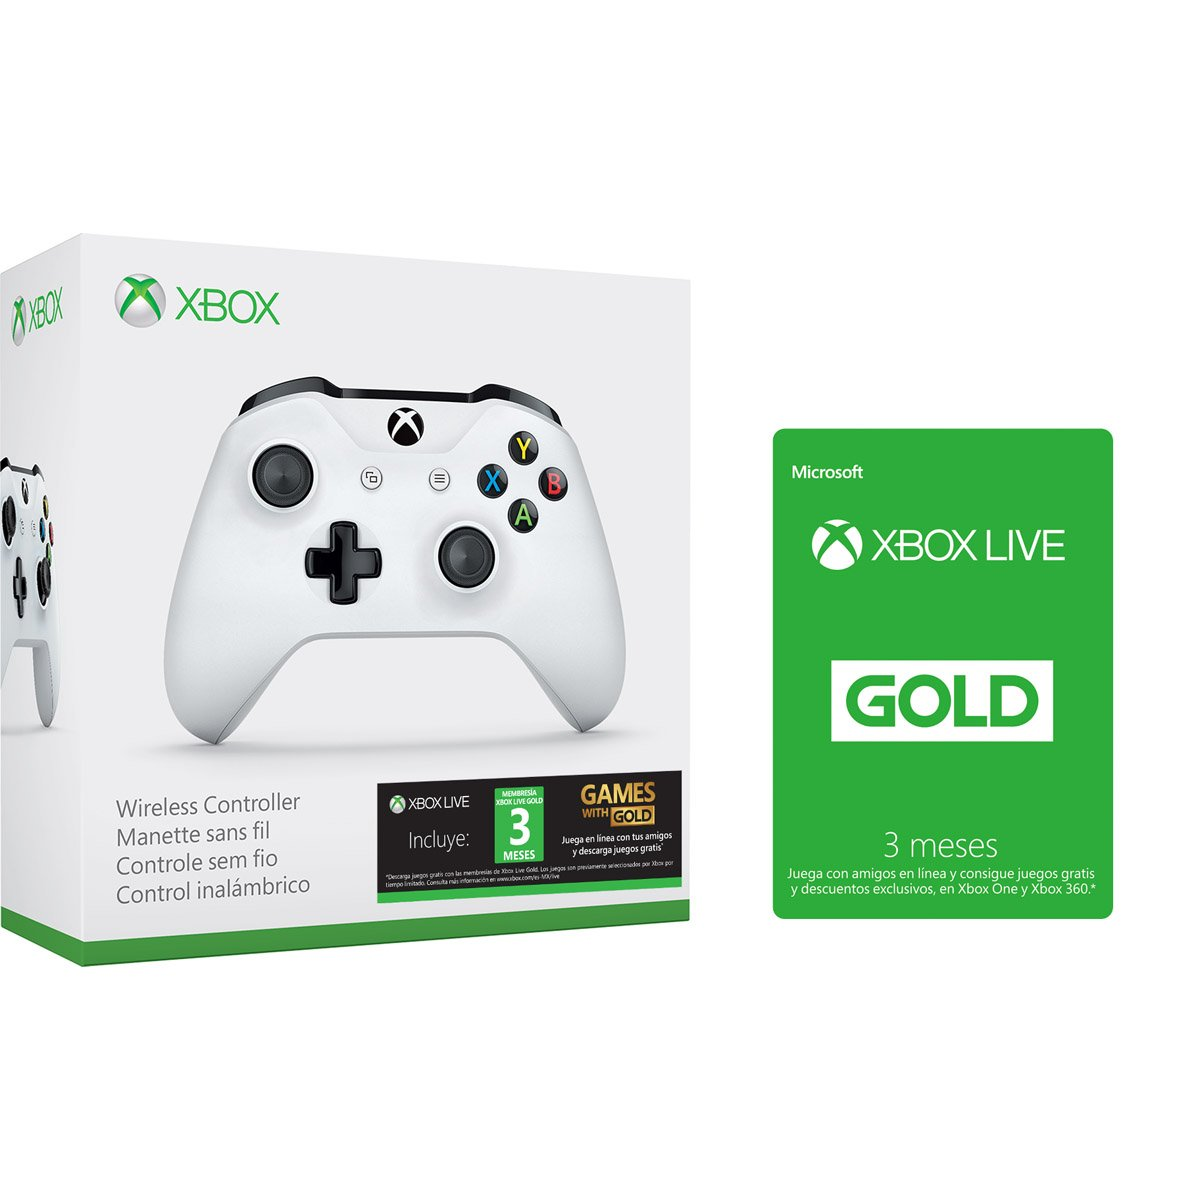 Xbox Control Inalambrico Blanco Tarjeta Xbox Live Gold 3m Sears